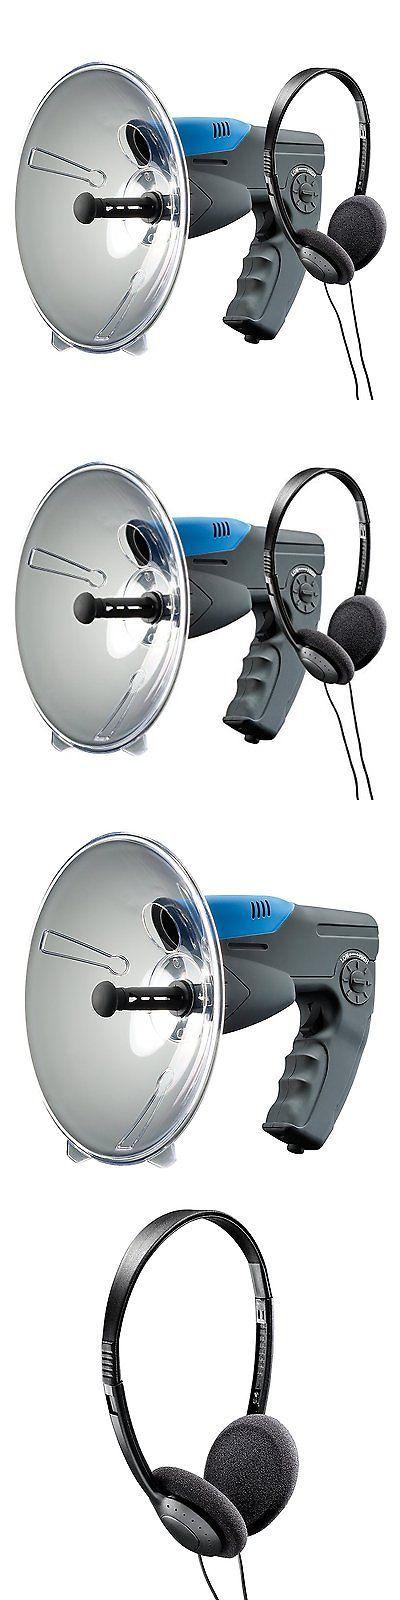 Surveillance Gadgets: Parabolic Microphone Spy Listening Device Bionic Ear Sound Amplifier 300M -> BUY IT NOW ONLY: $35.42 on eBay!